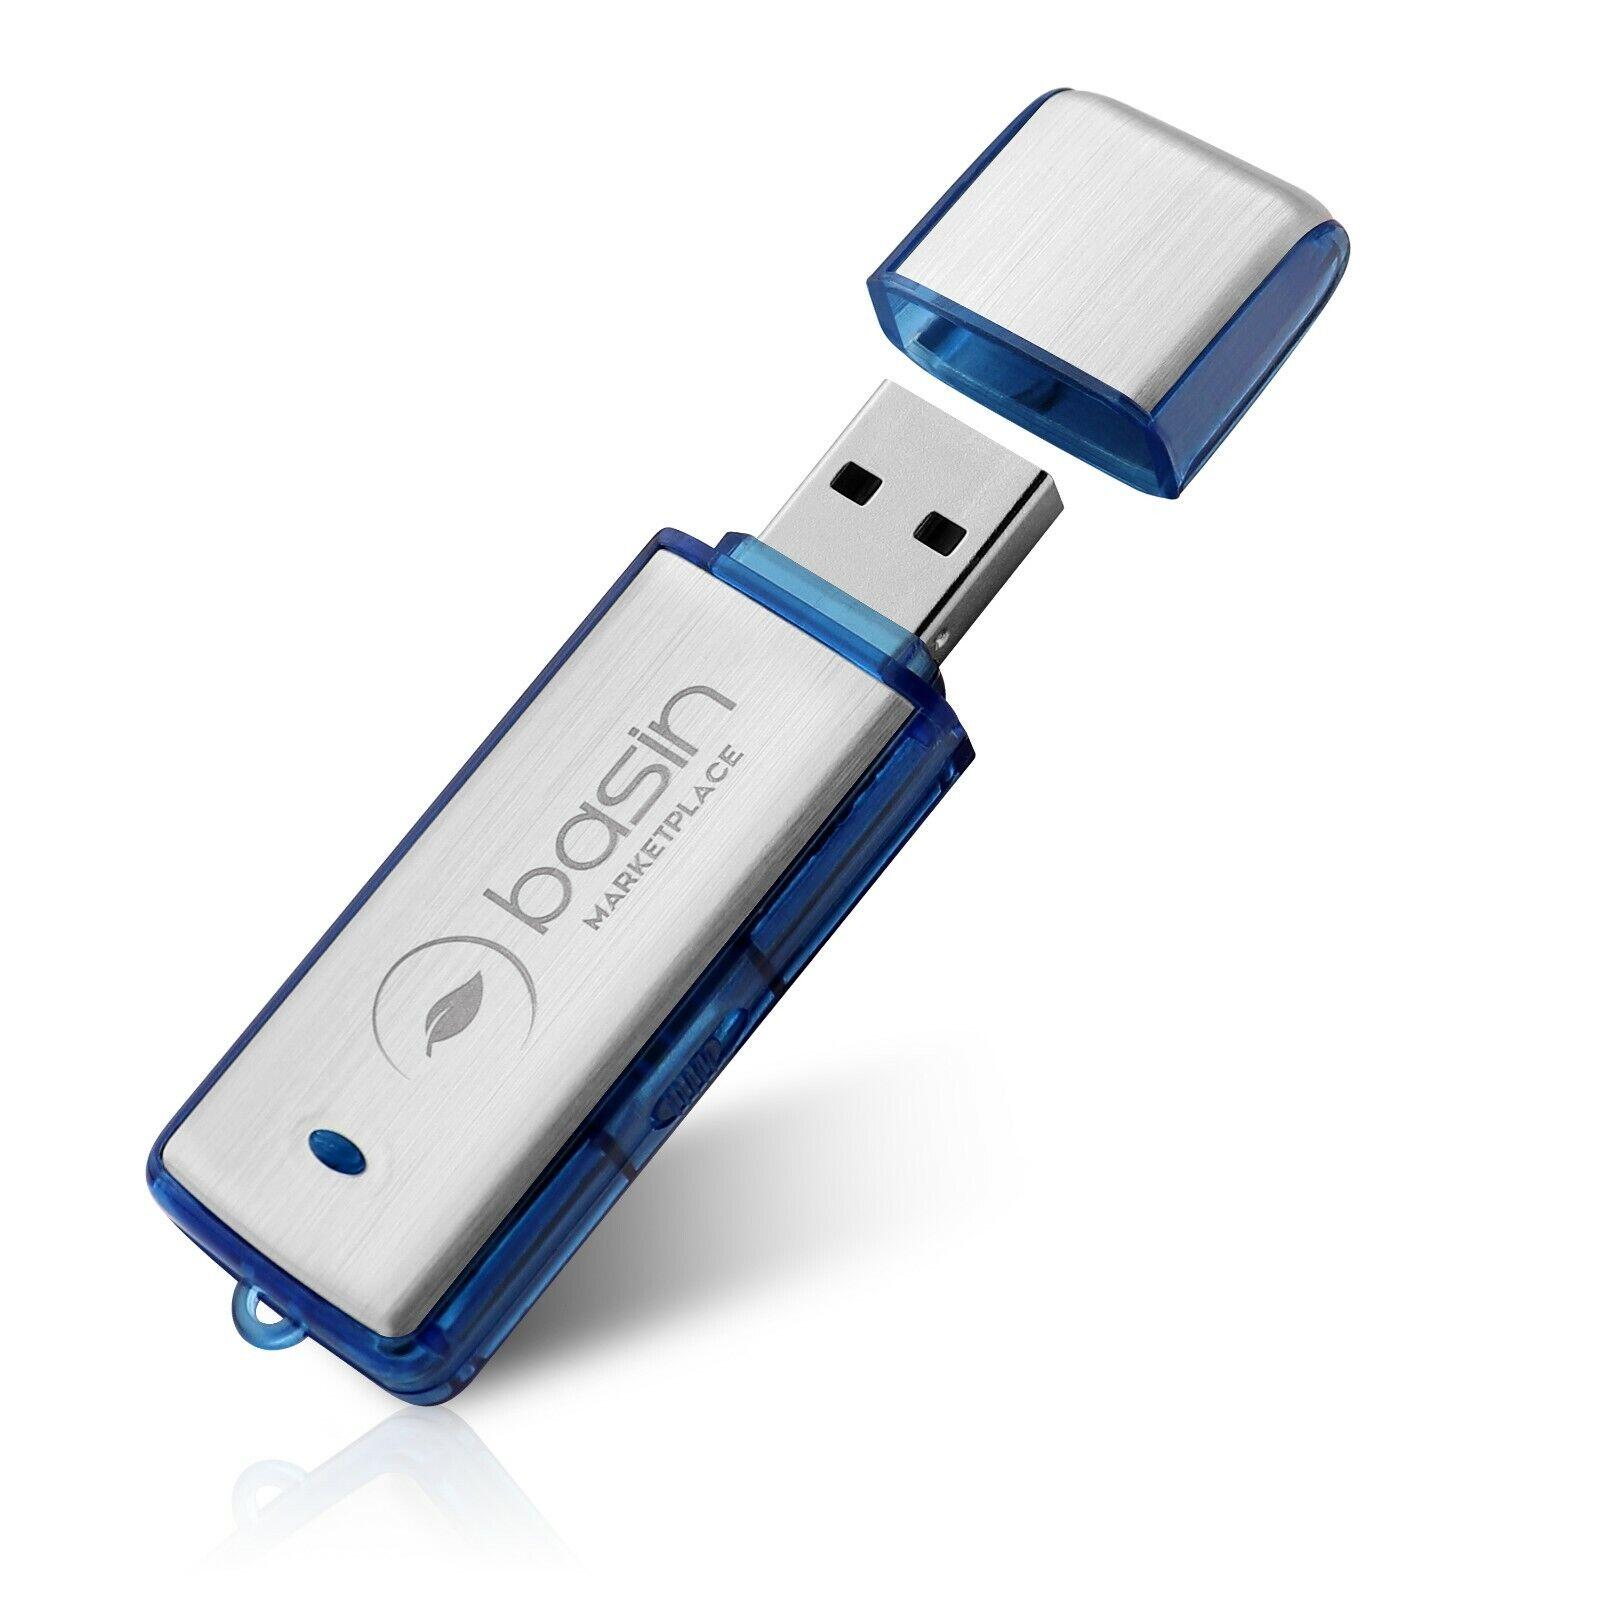 Mini USB Digital Voice Recorder For Lectures, School, Busine